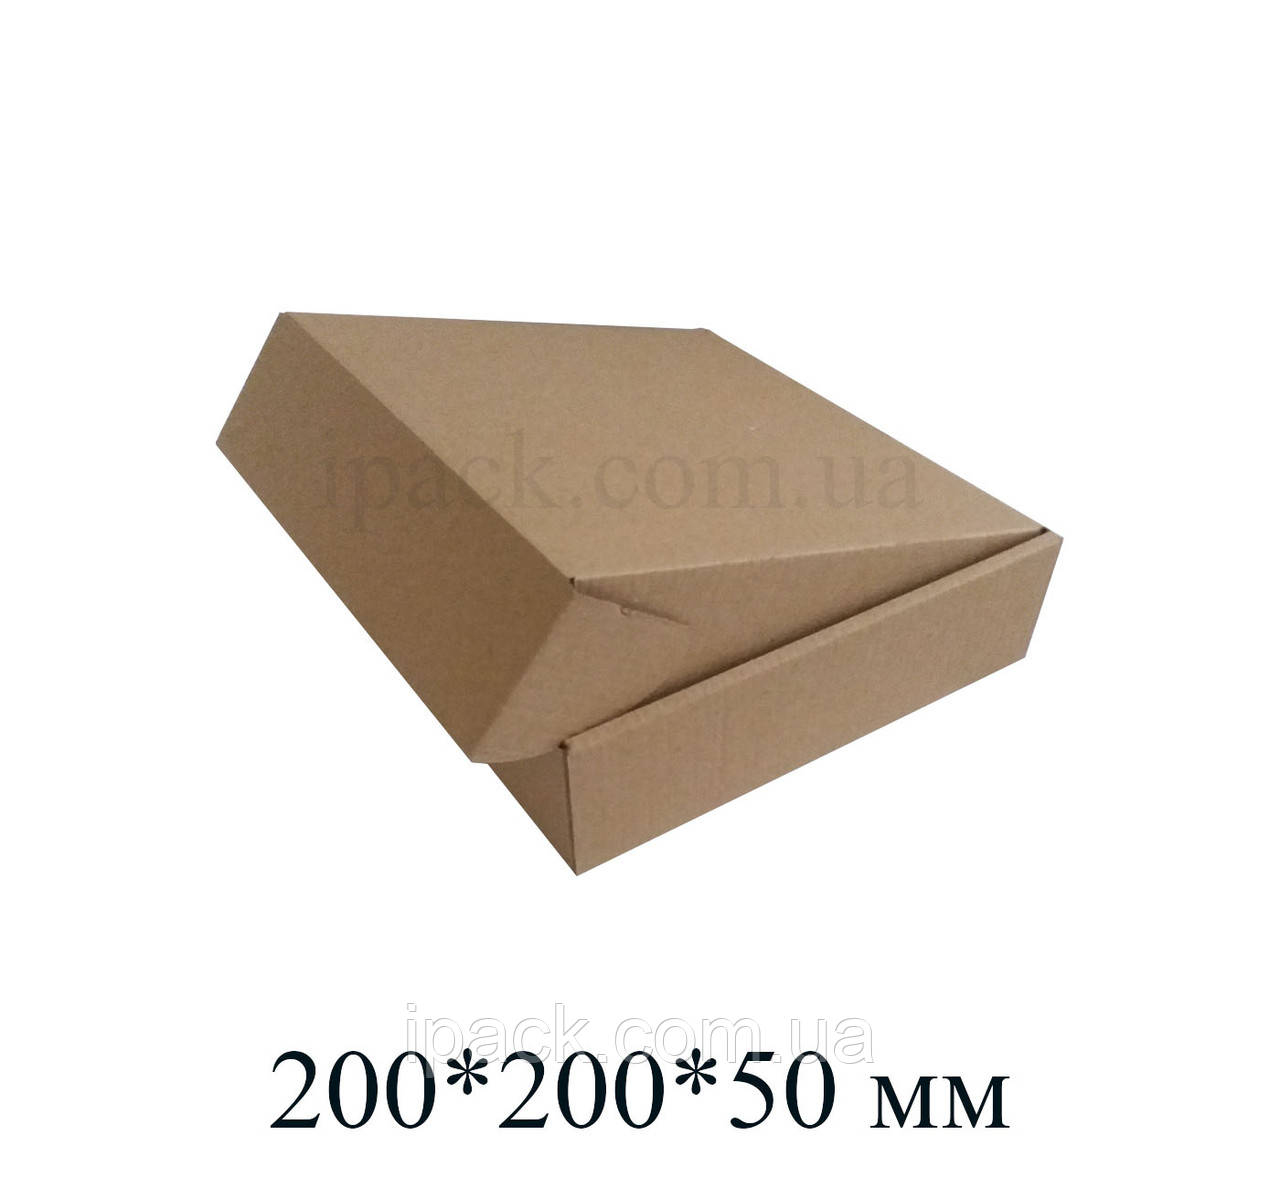 Коробка картонная самосборная, 200*200*50, мм, бурая, крафт, микрогофрокартон